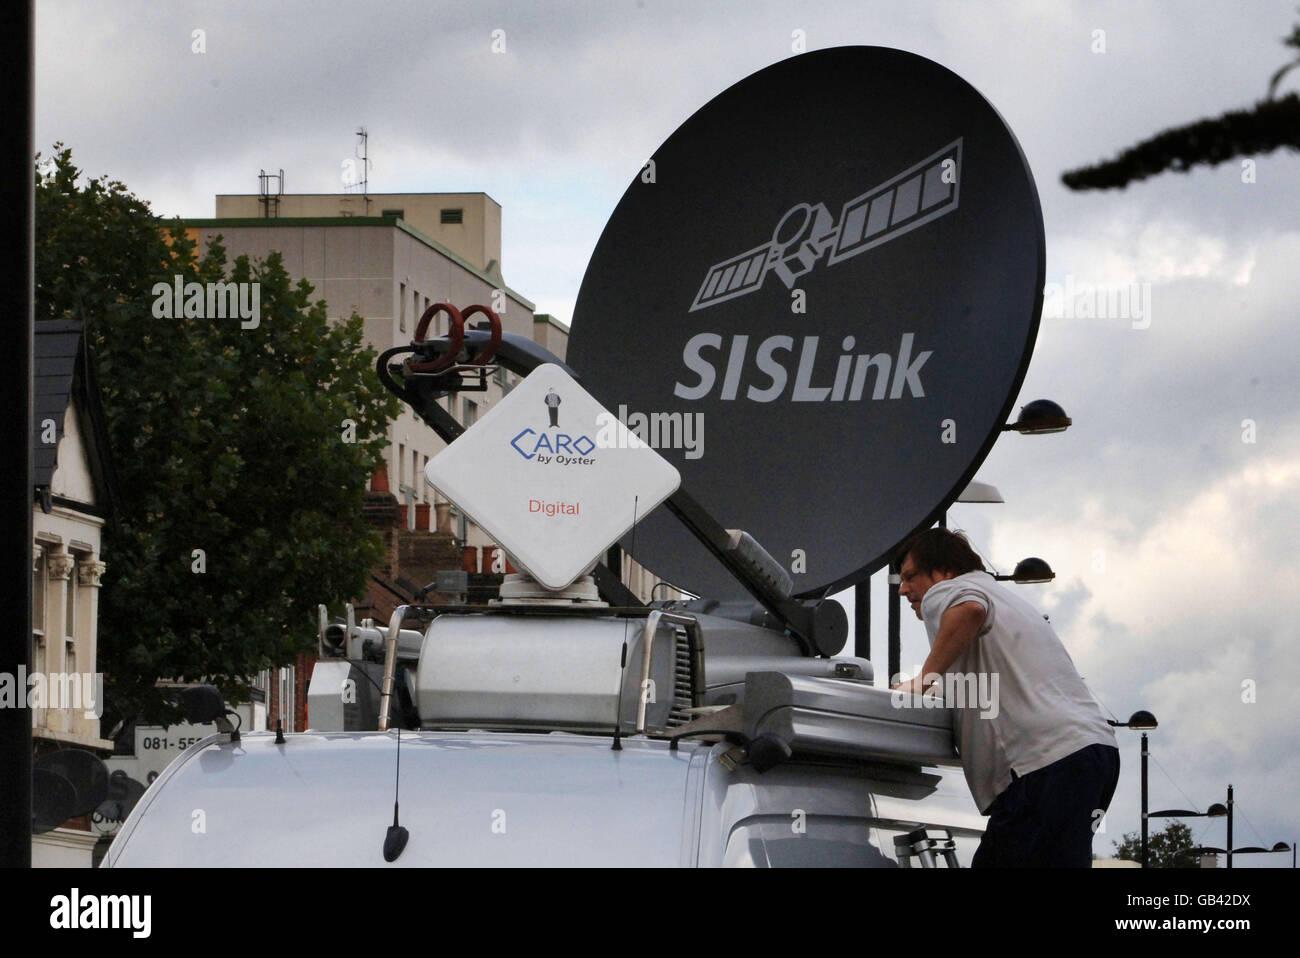 TV Broadcast vehicle - Stock Image